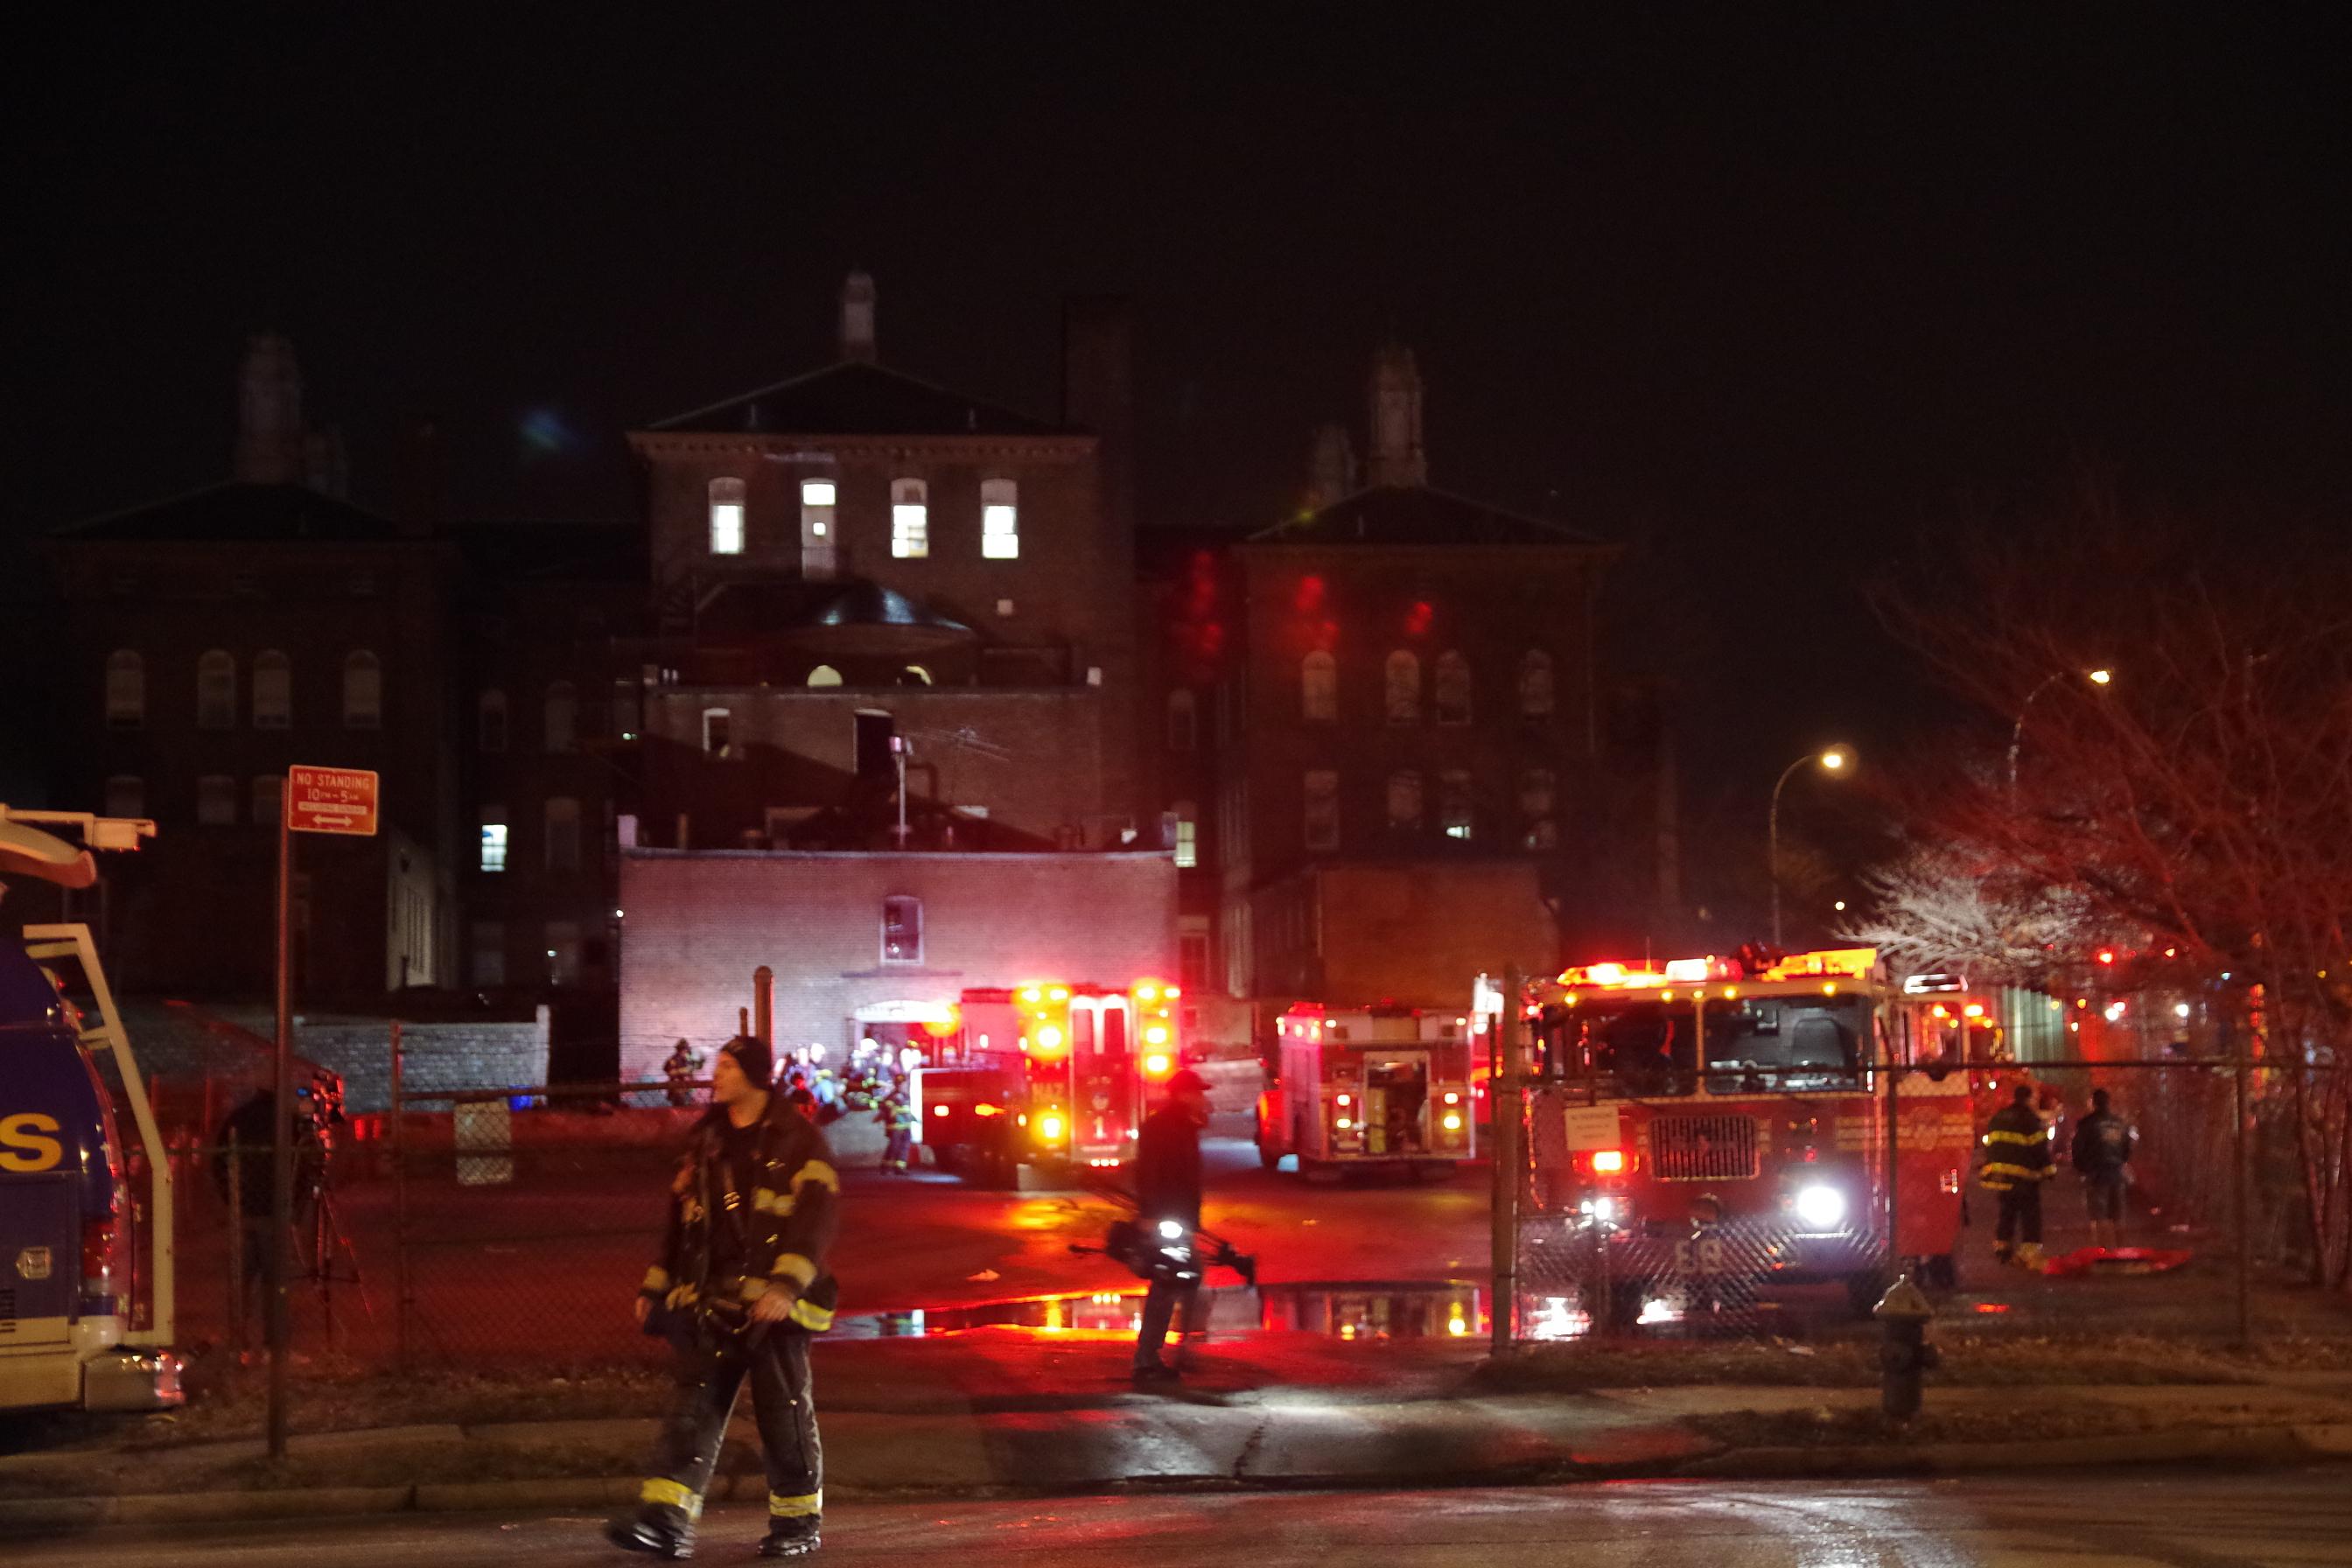 3-Alarm fire at Monsignor Scanlan High School